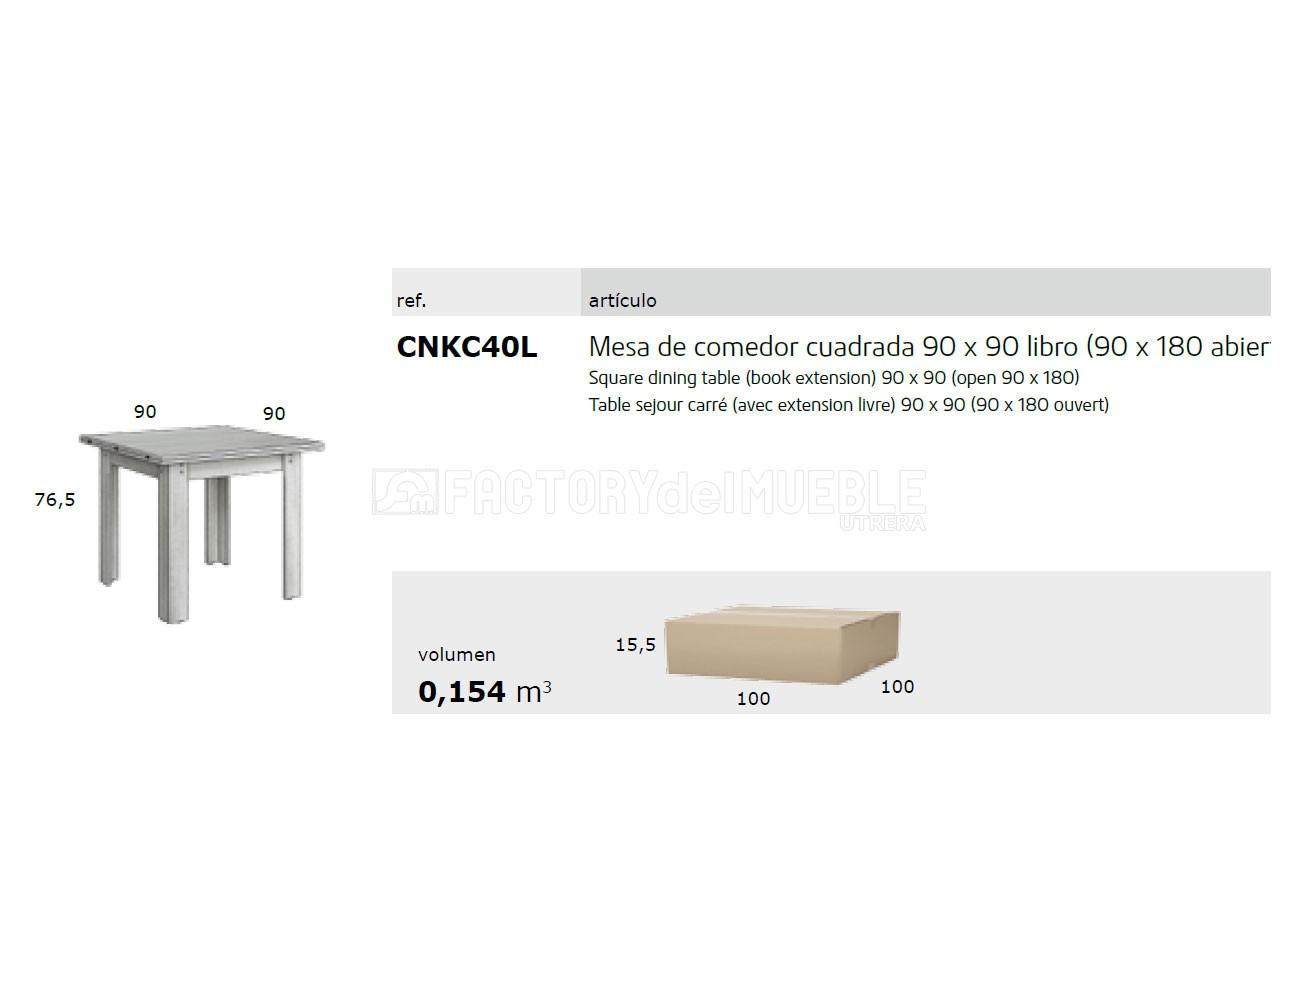 Cnkc40l